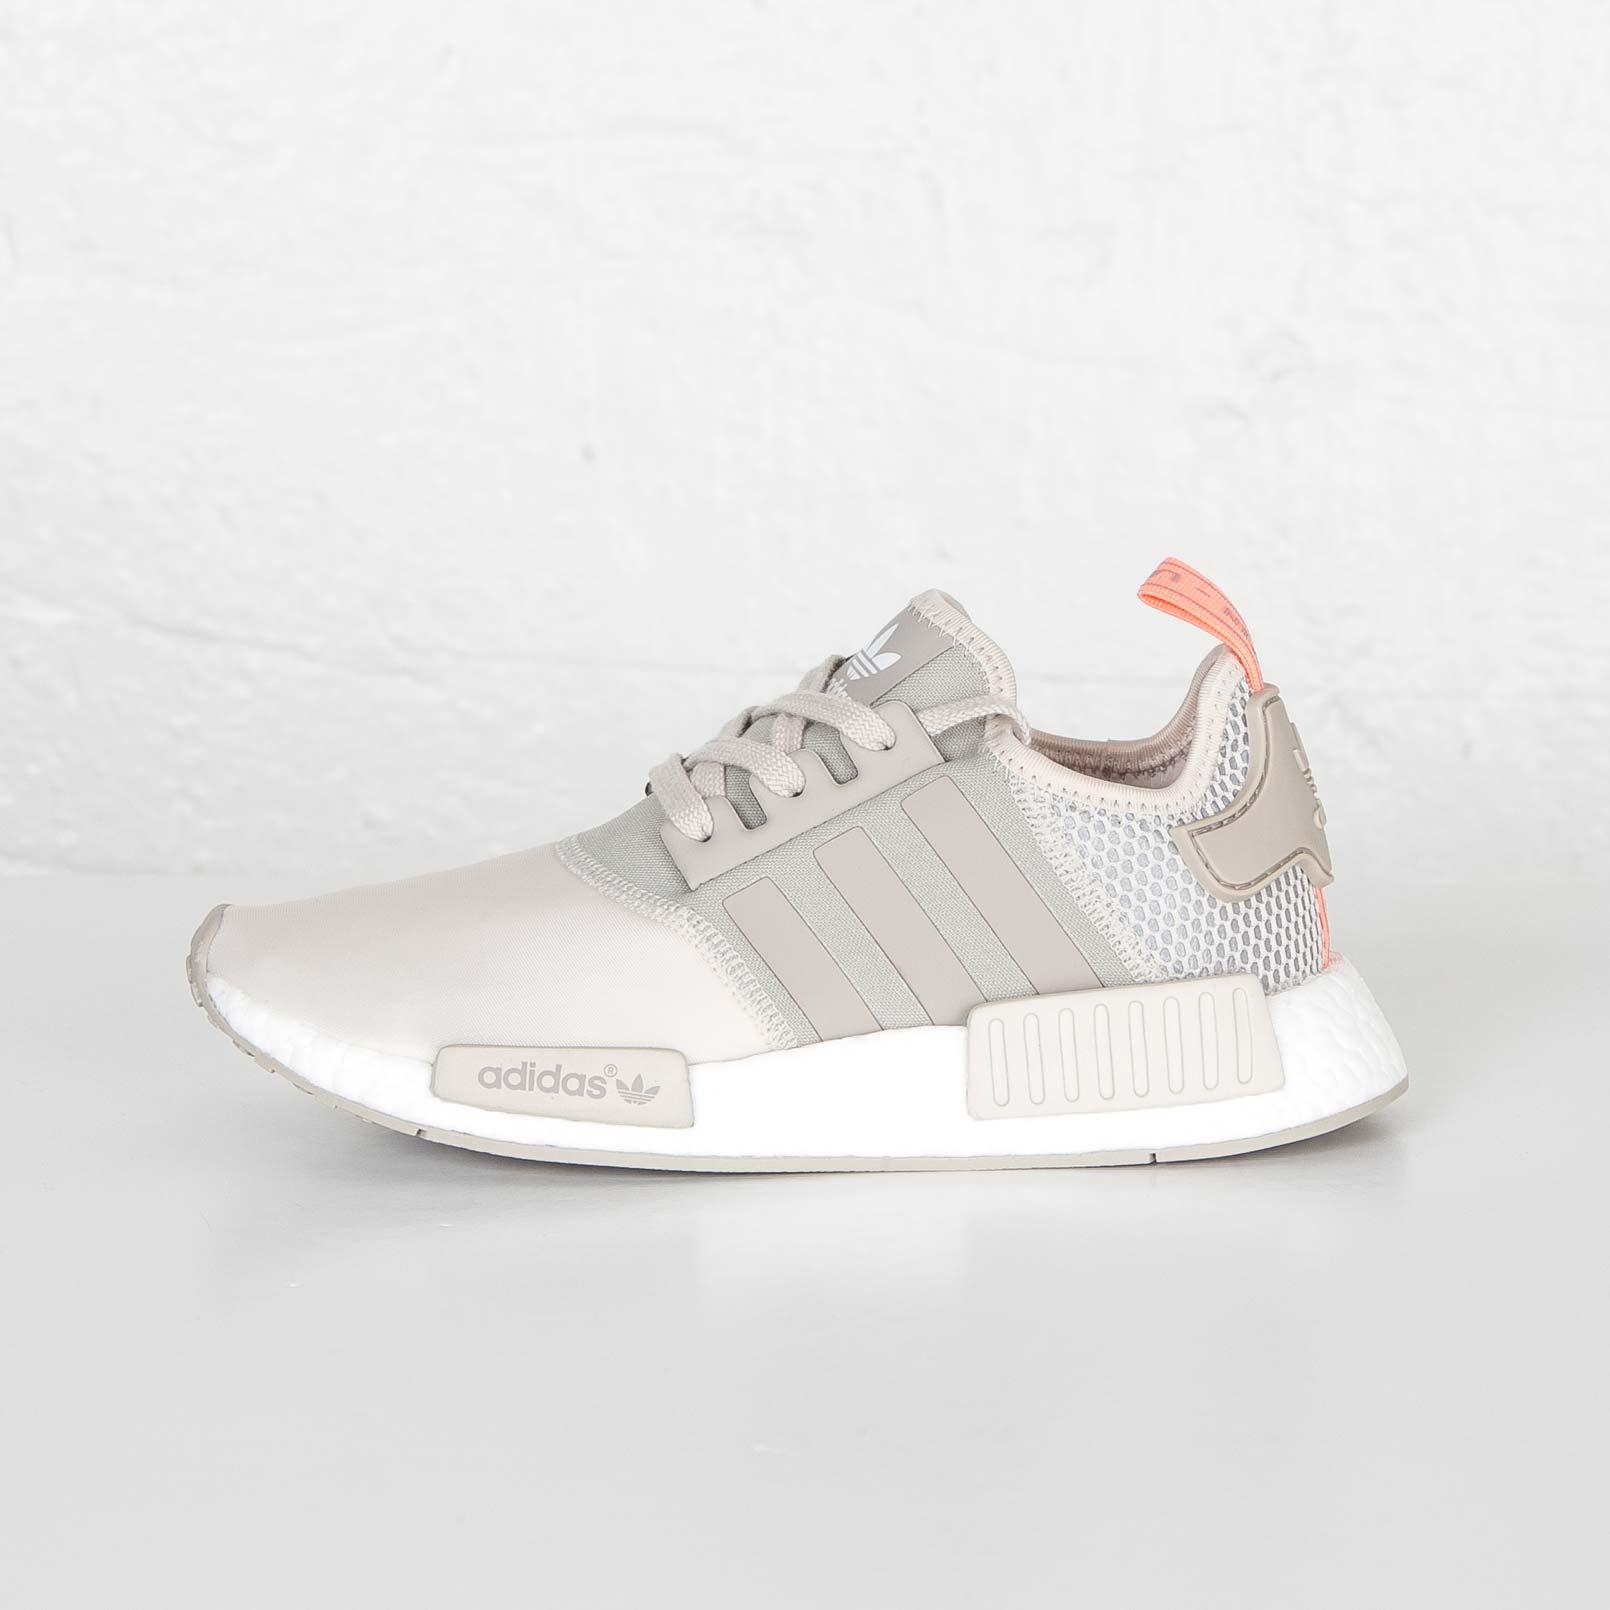 312453a120faf adidas NMD R1 W - S75233 - Sneakersnstuff